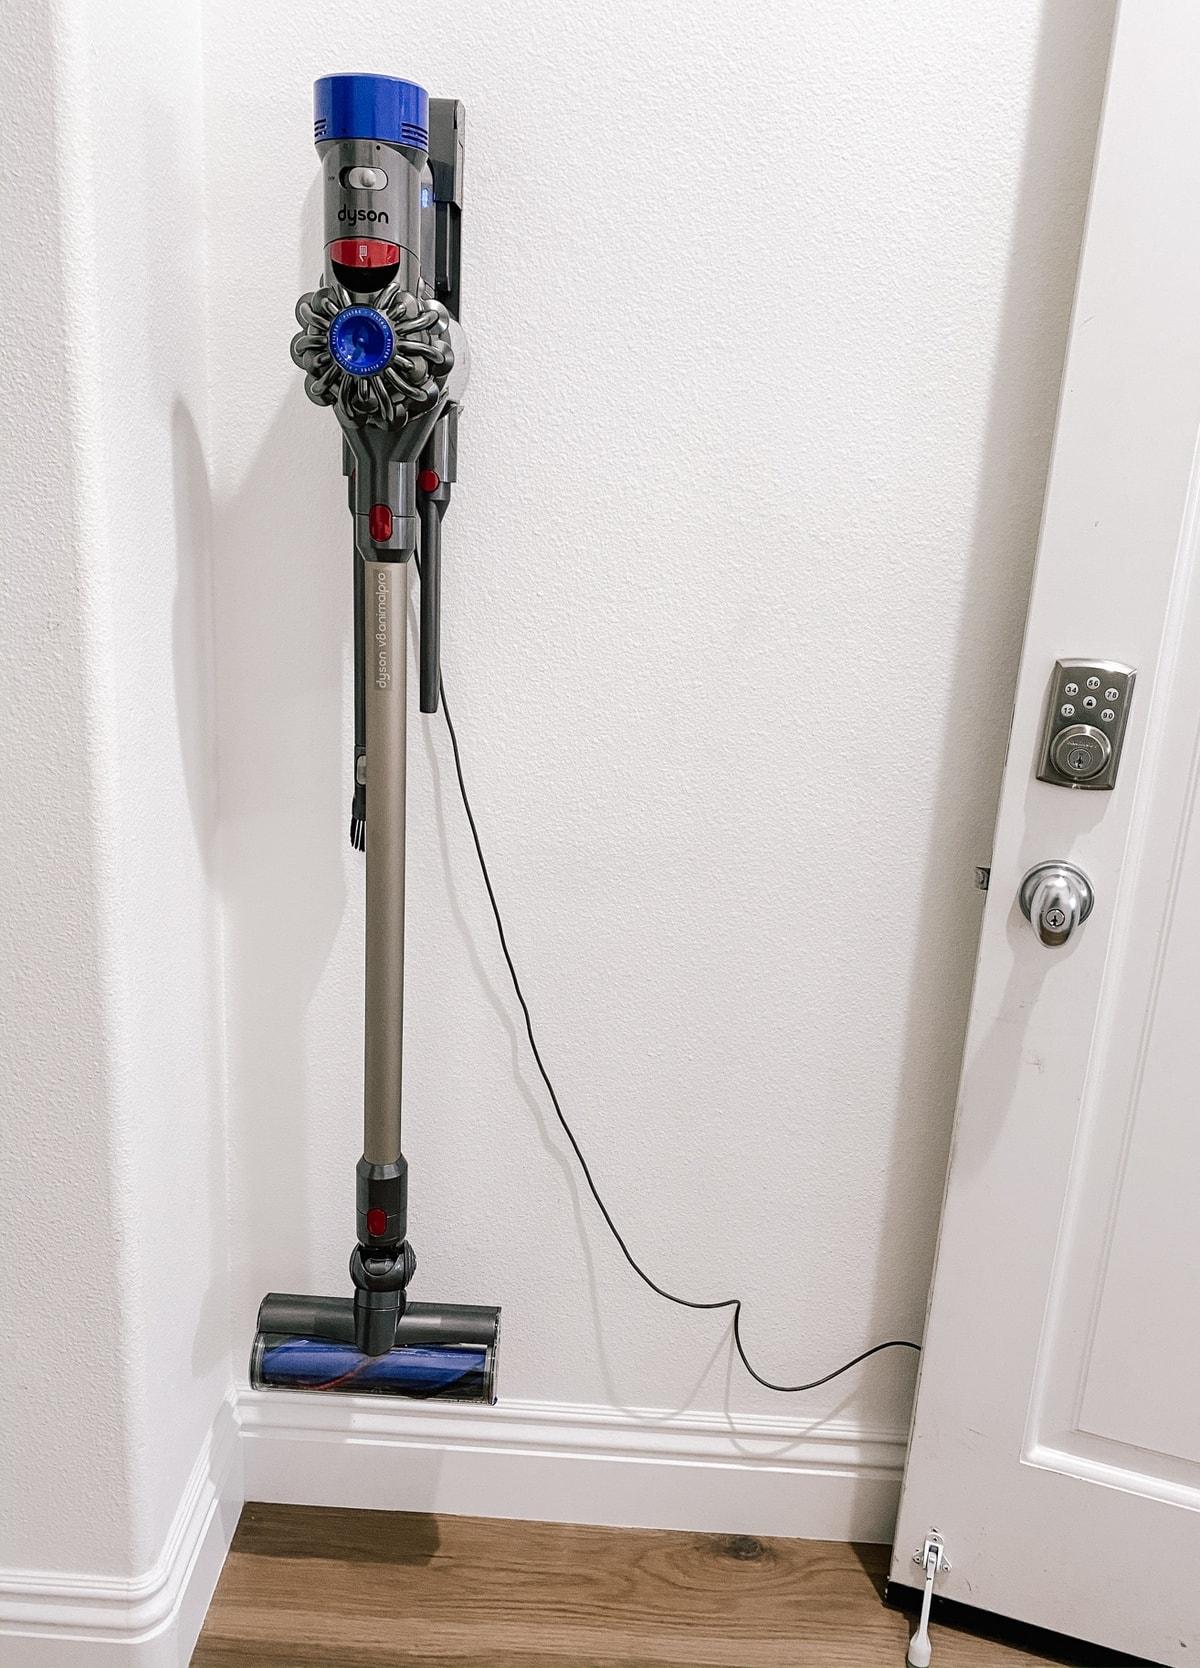 dyson v8 animal cordless vacuum deal